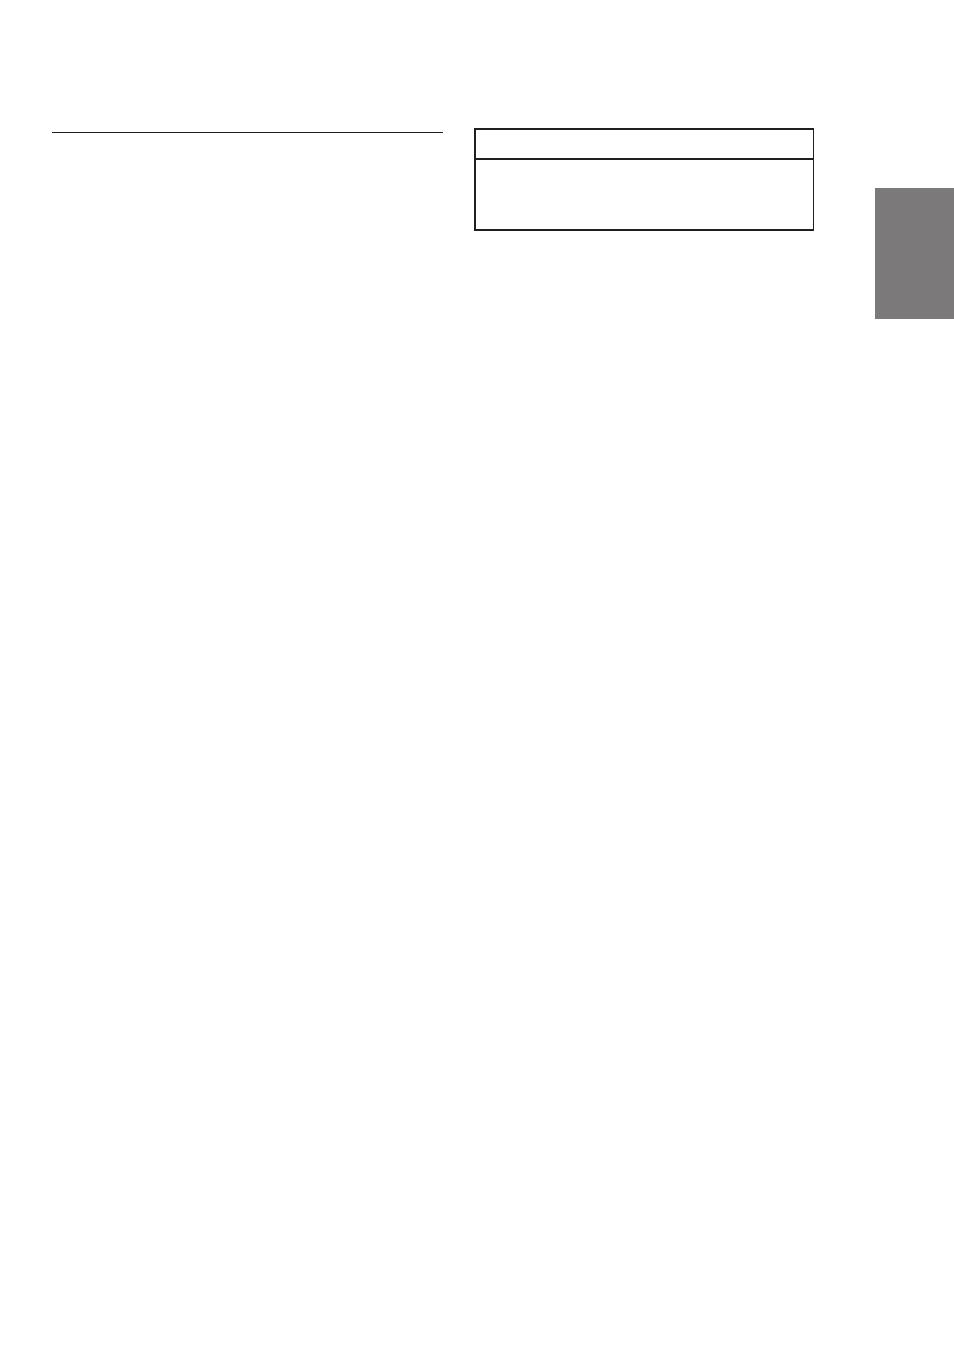 En fr es de se it specifications alpine pxa h700 user manual en fr es de se it specifications alpine pxa h700 user manual publicscrutiny Choice Image